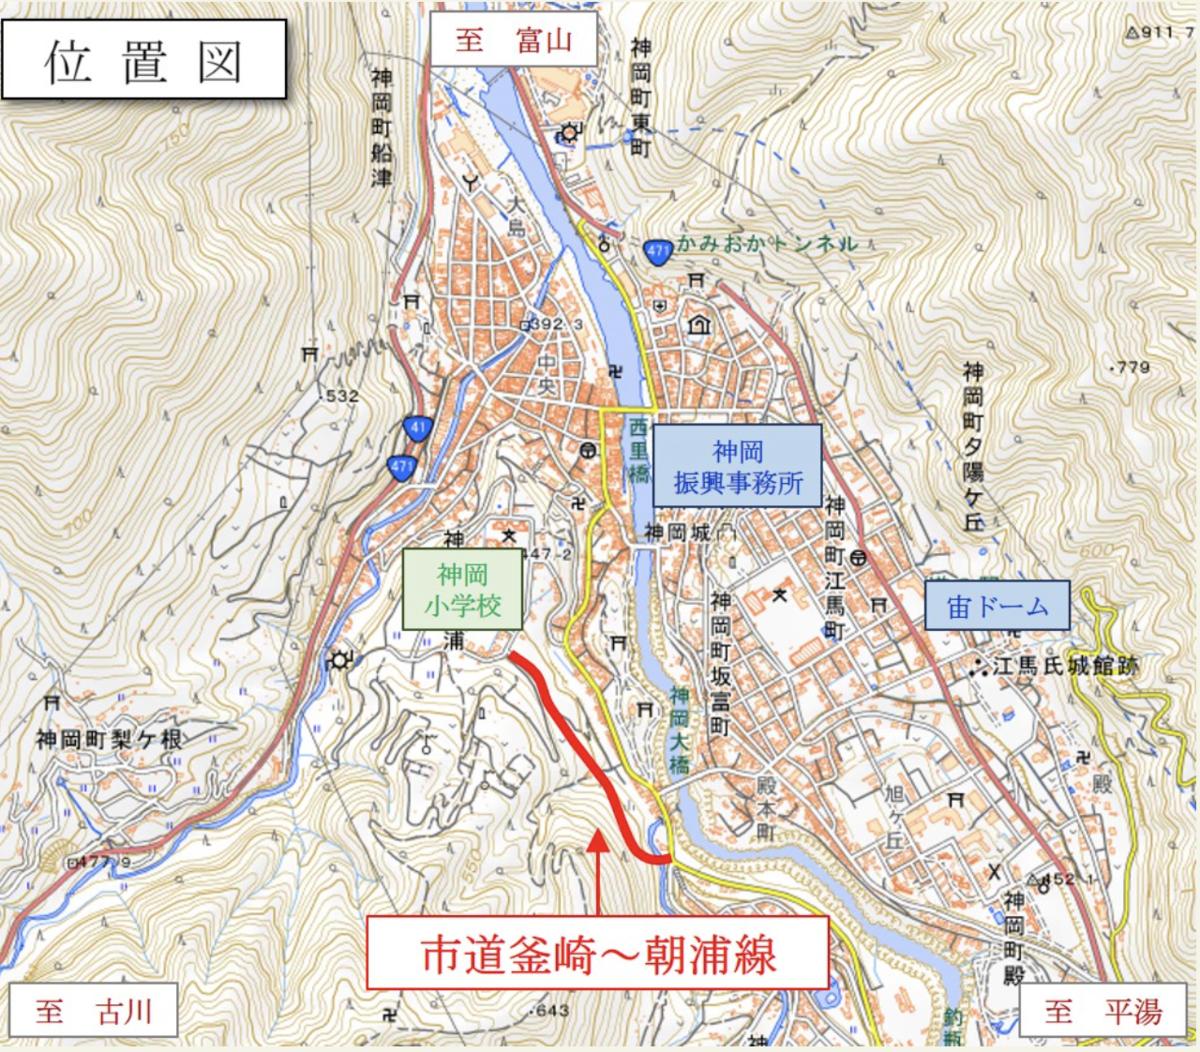 f:id:zakiyamatakashi:20210707205016p:plain